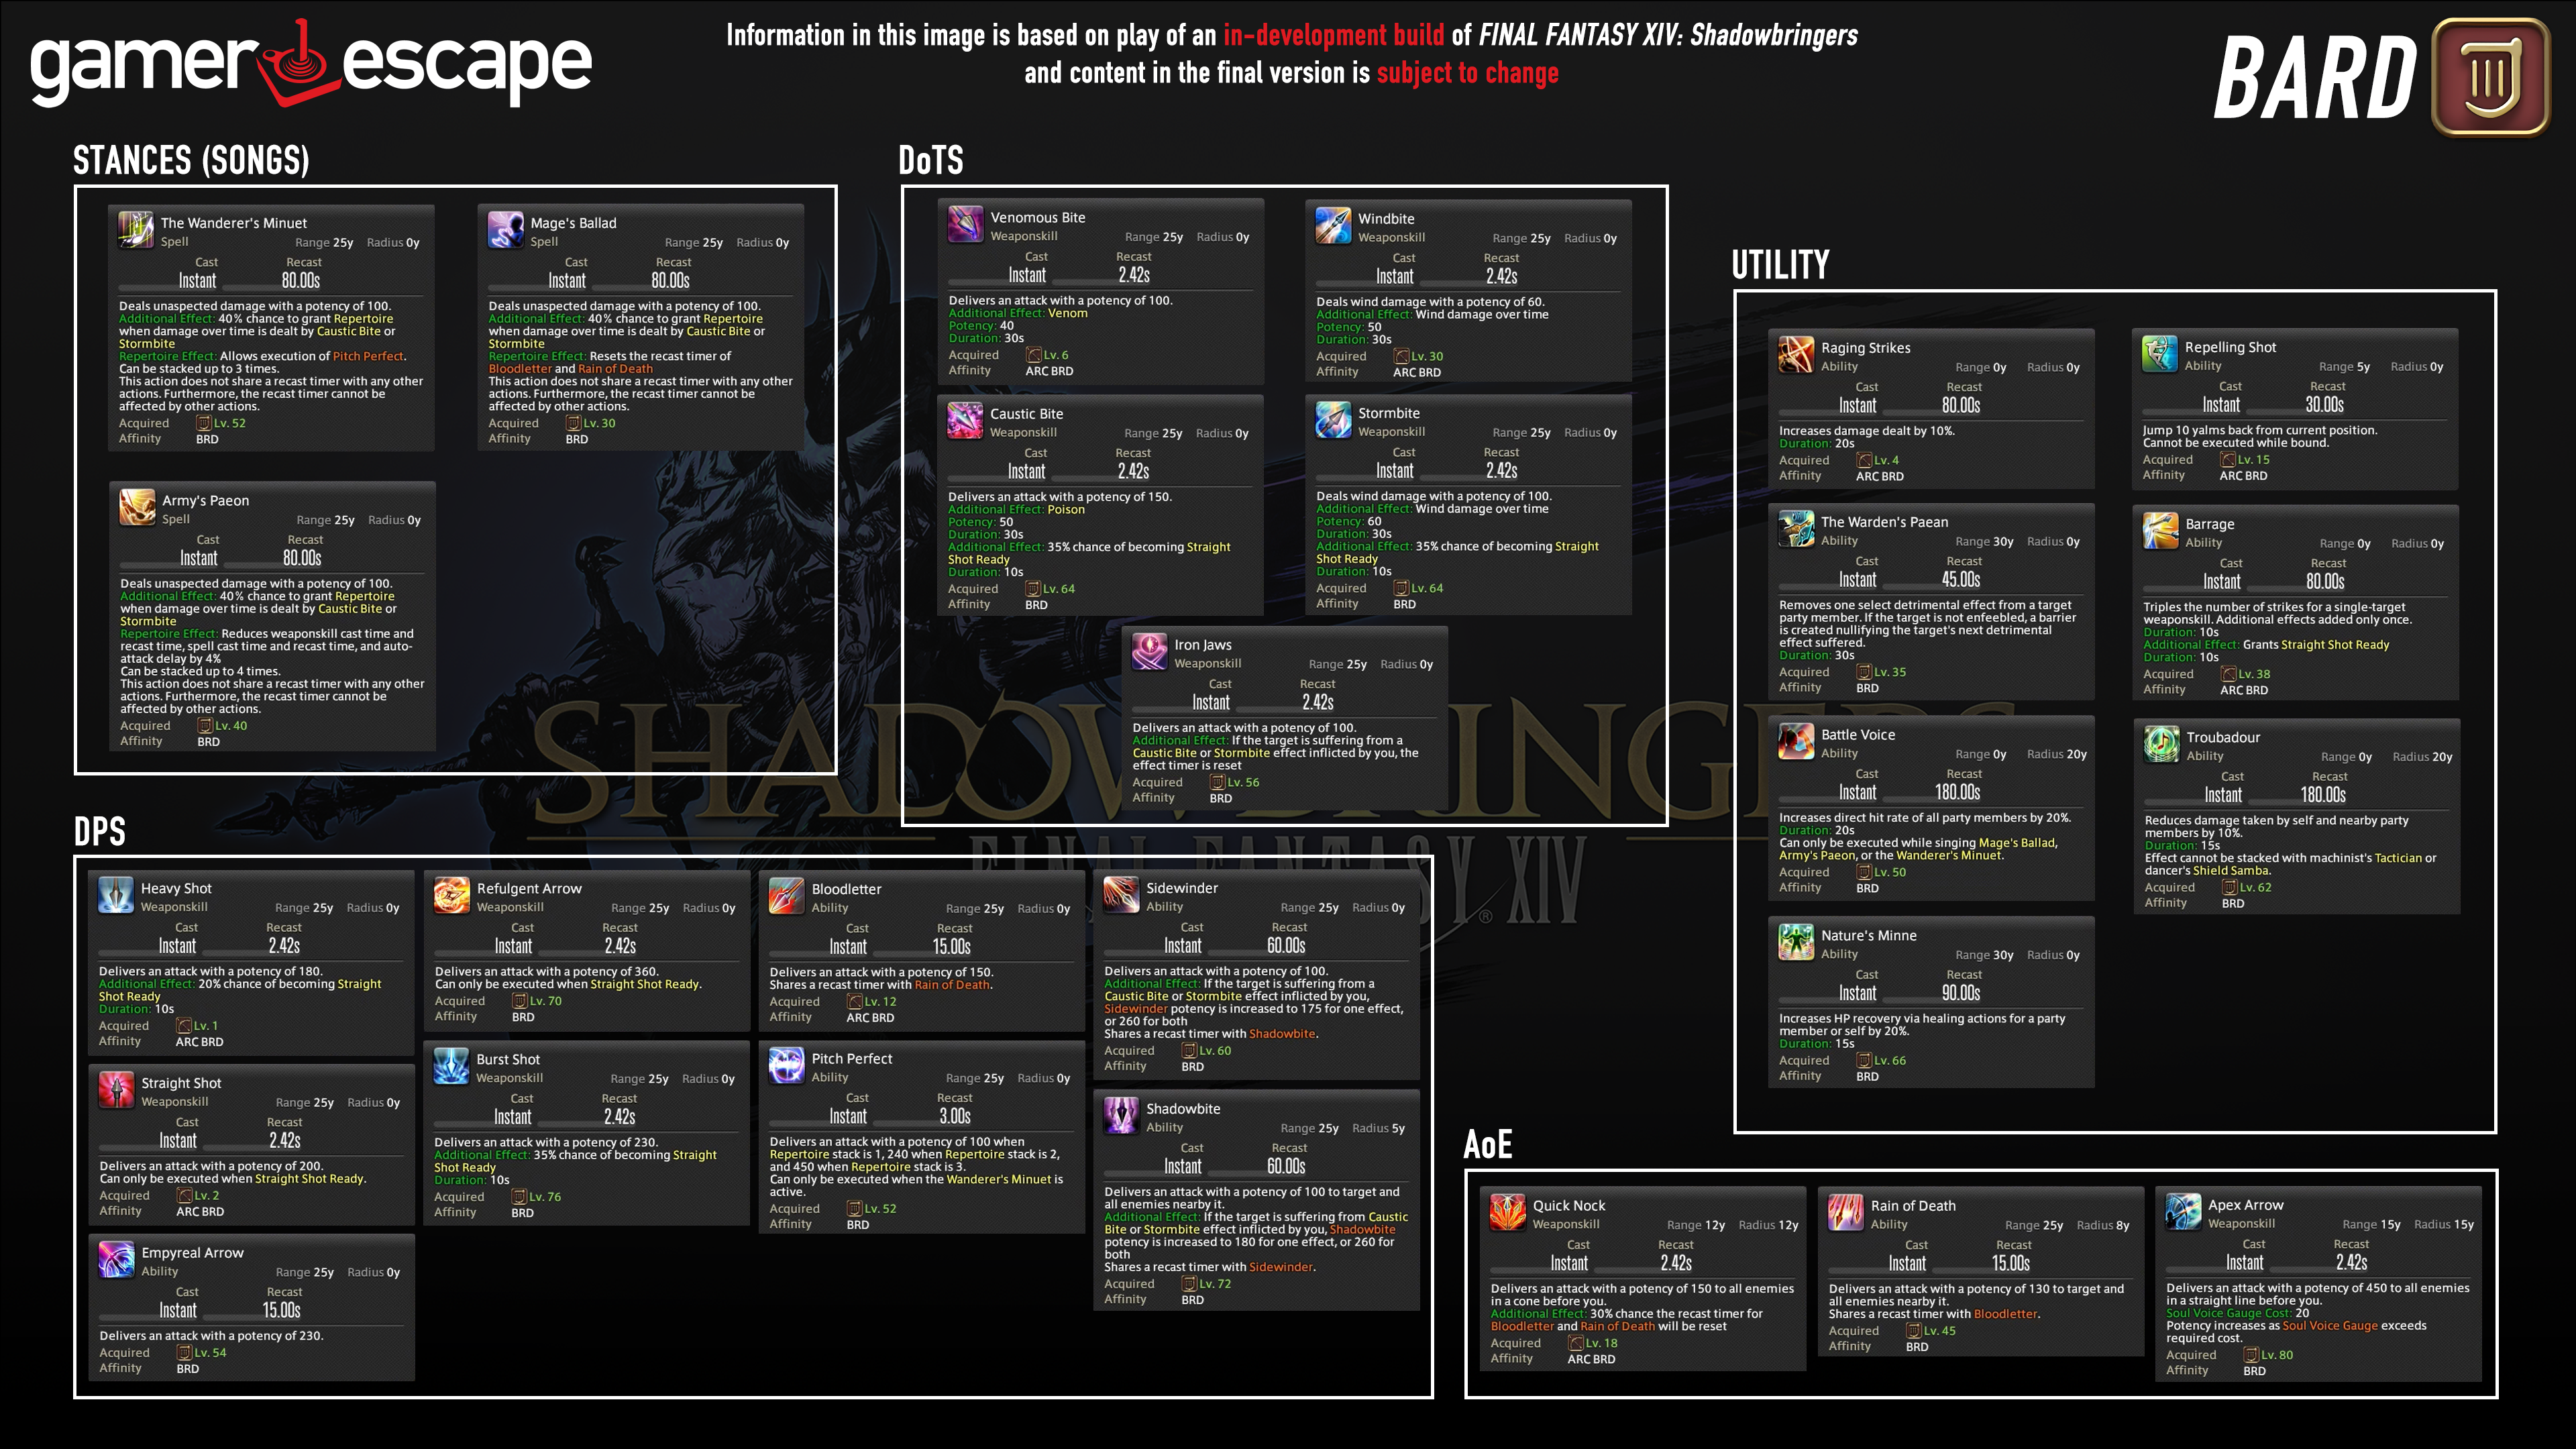 Final Fantasy XIV: Shadowbringers Hands-On with Bard – Gamer Escape